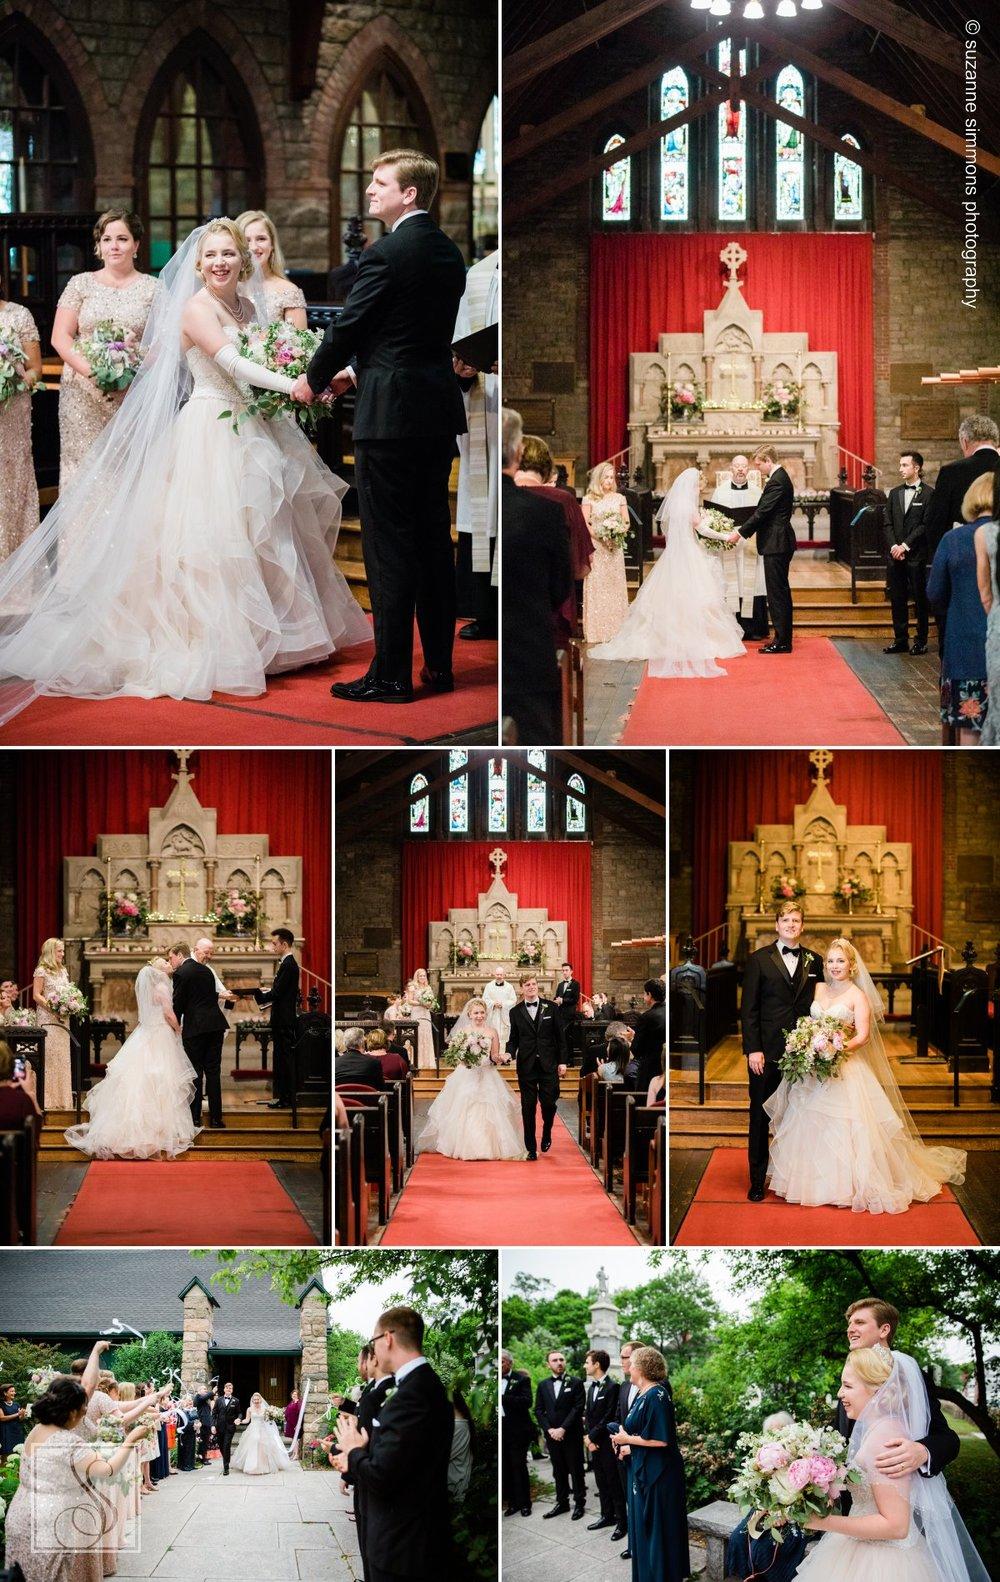 Wedding Ceremony at St Saviour's Episcopal Church